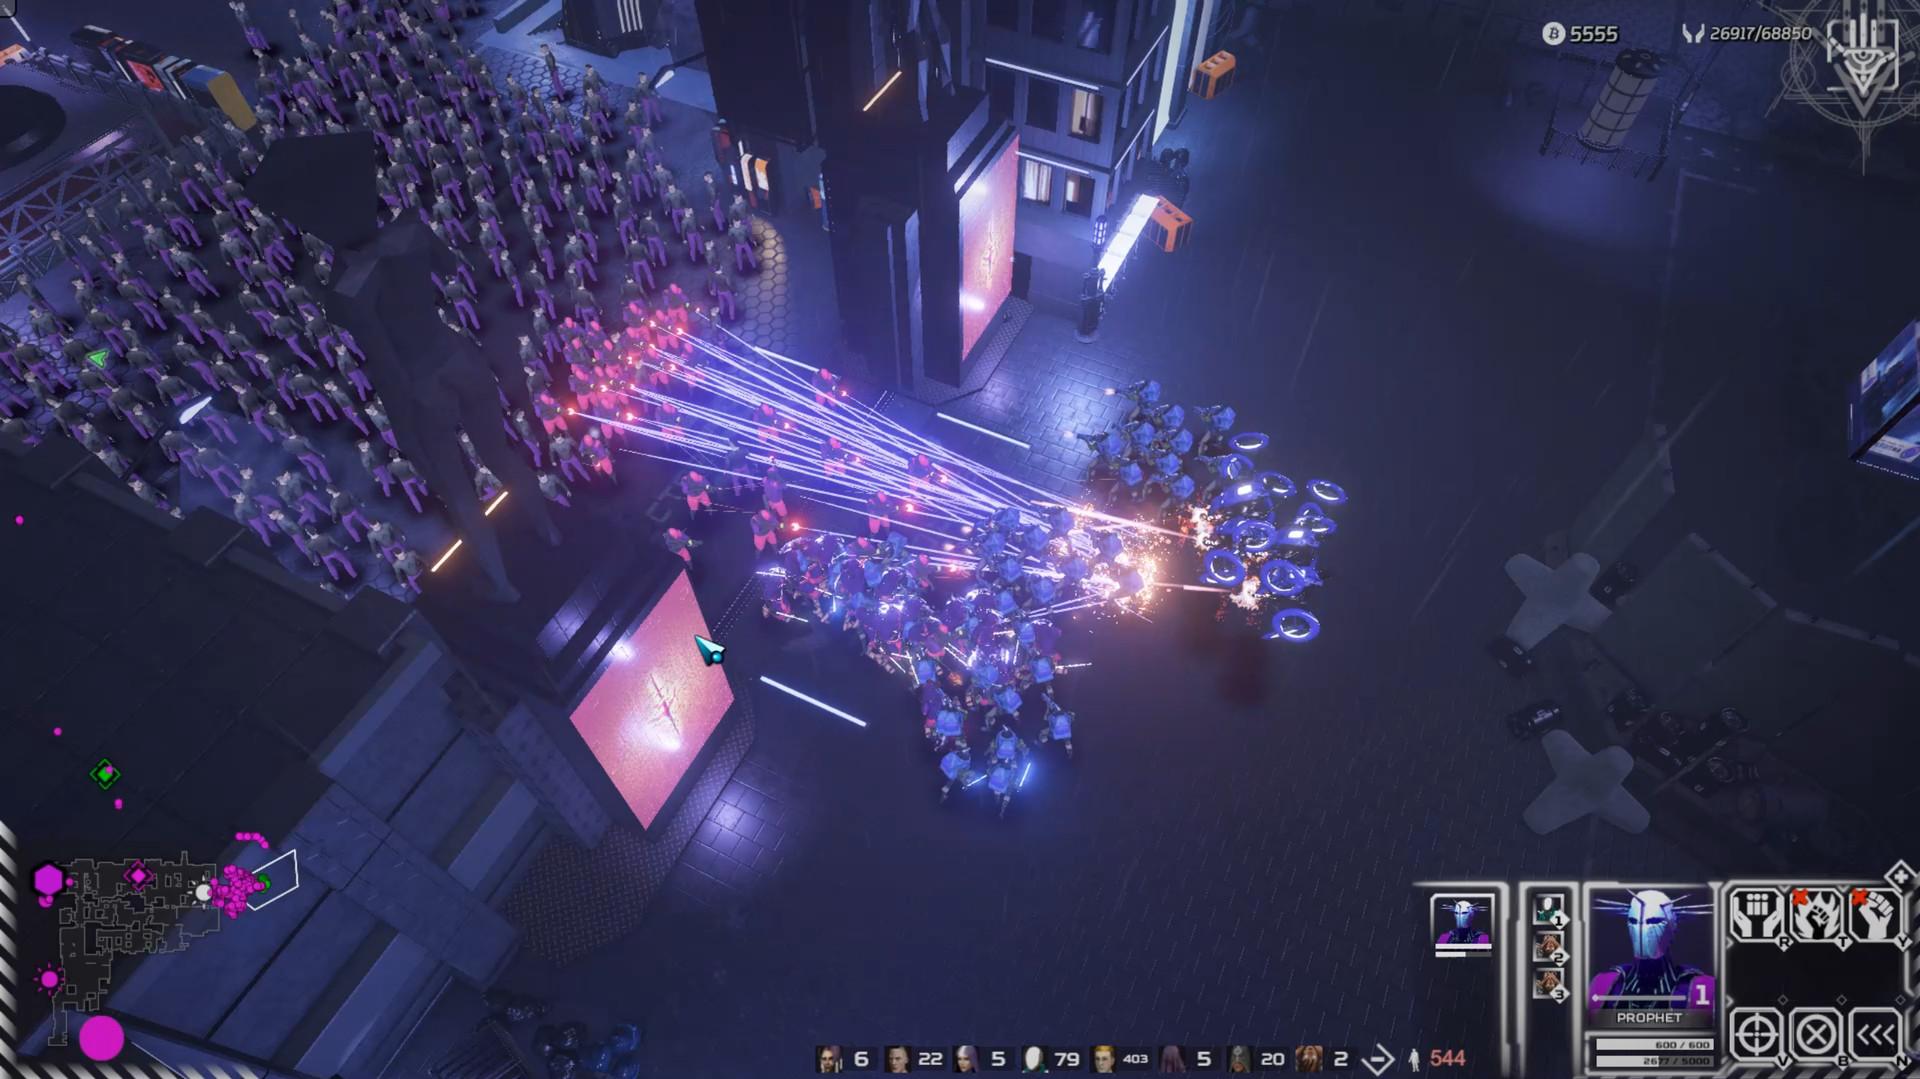 Cyberpunk RTS Re-Legion gets release date